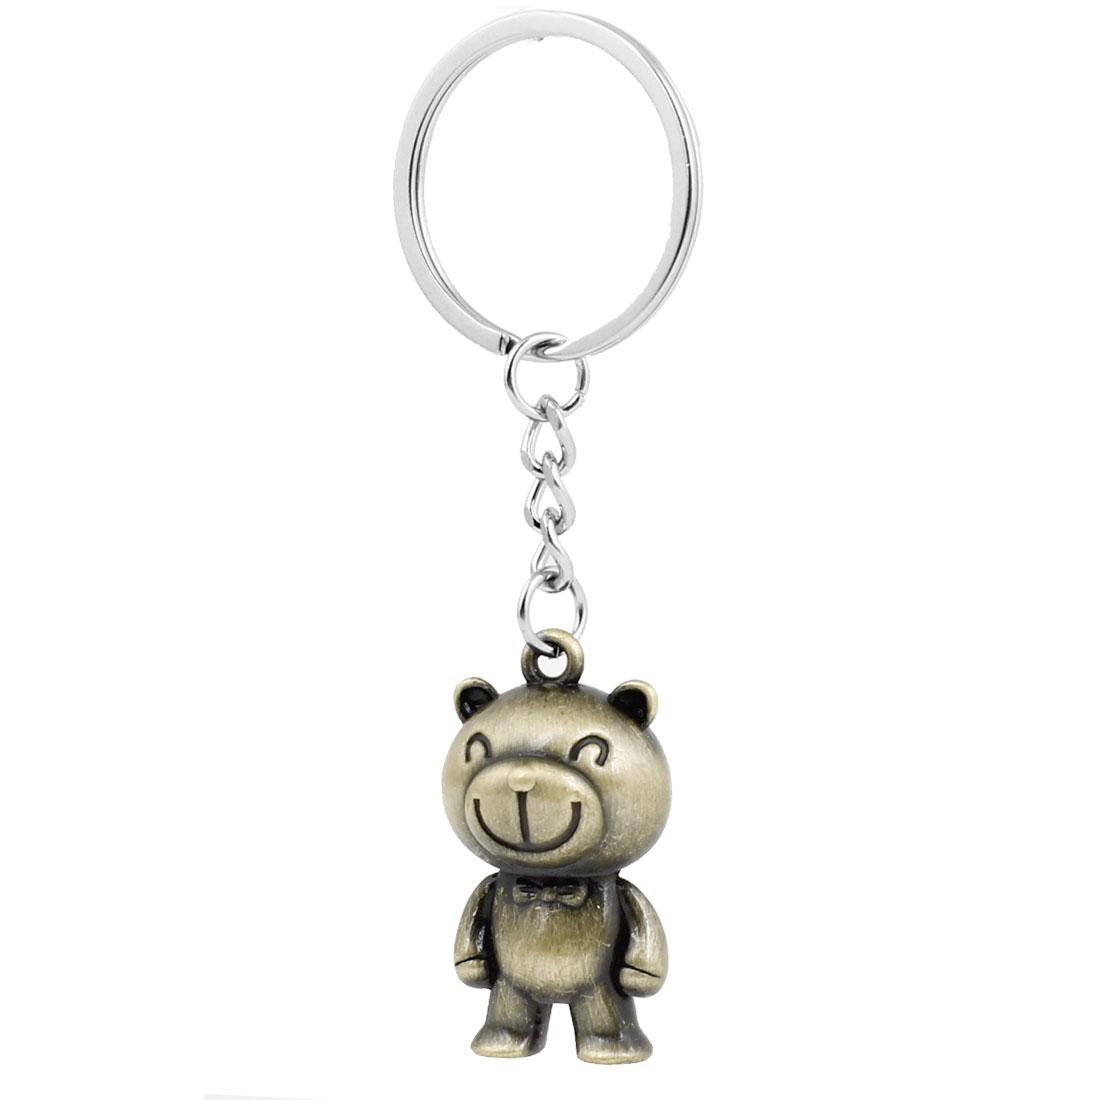 Bronze Tone Metal Smiling Souvenir Bear Pendant Keychain